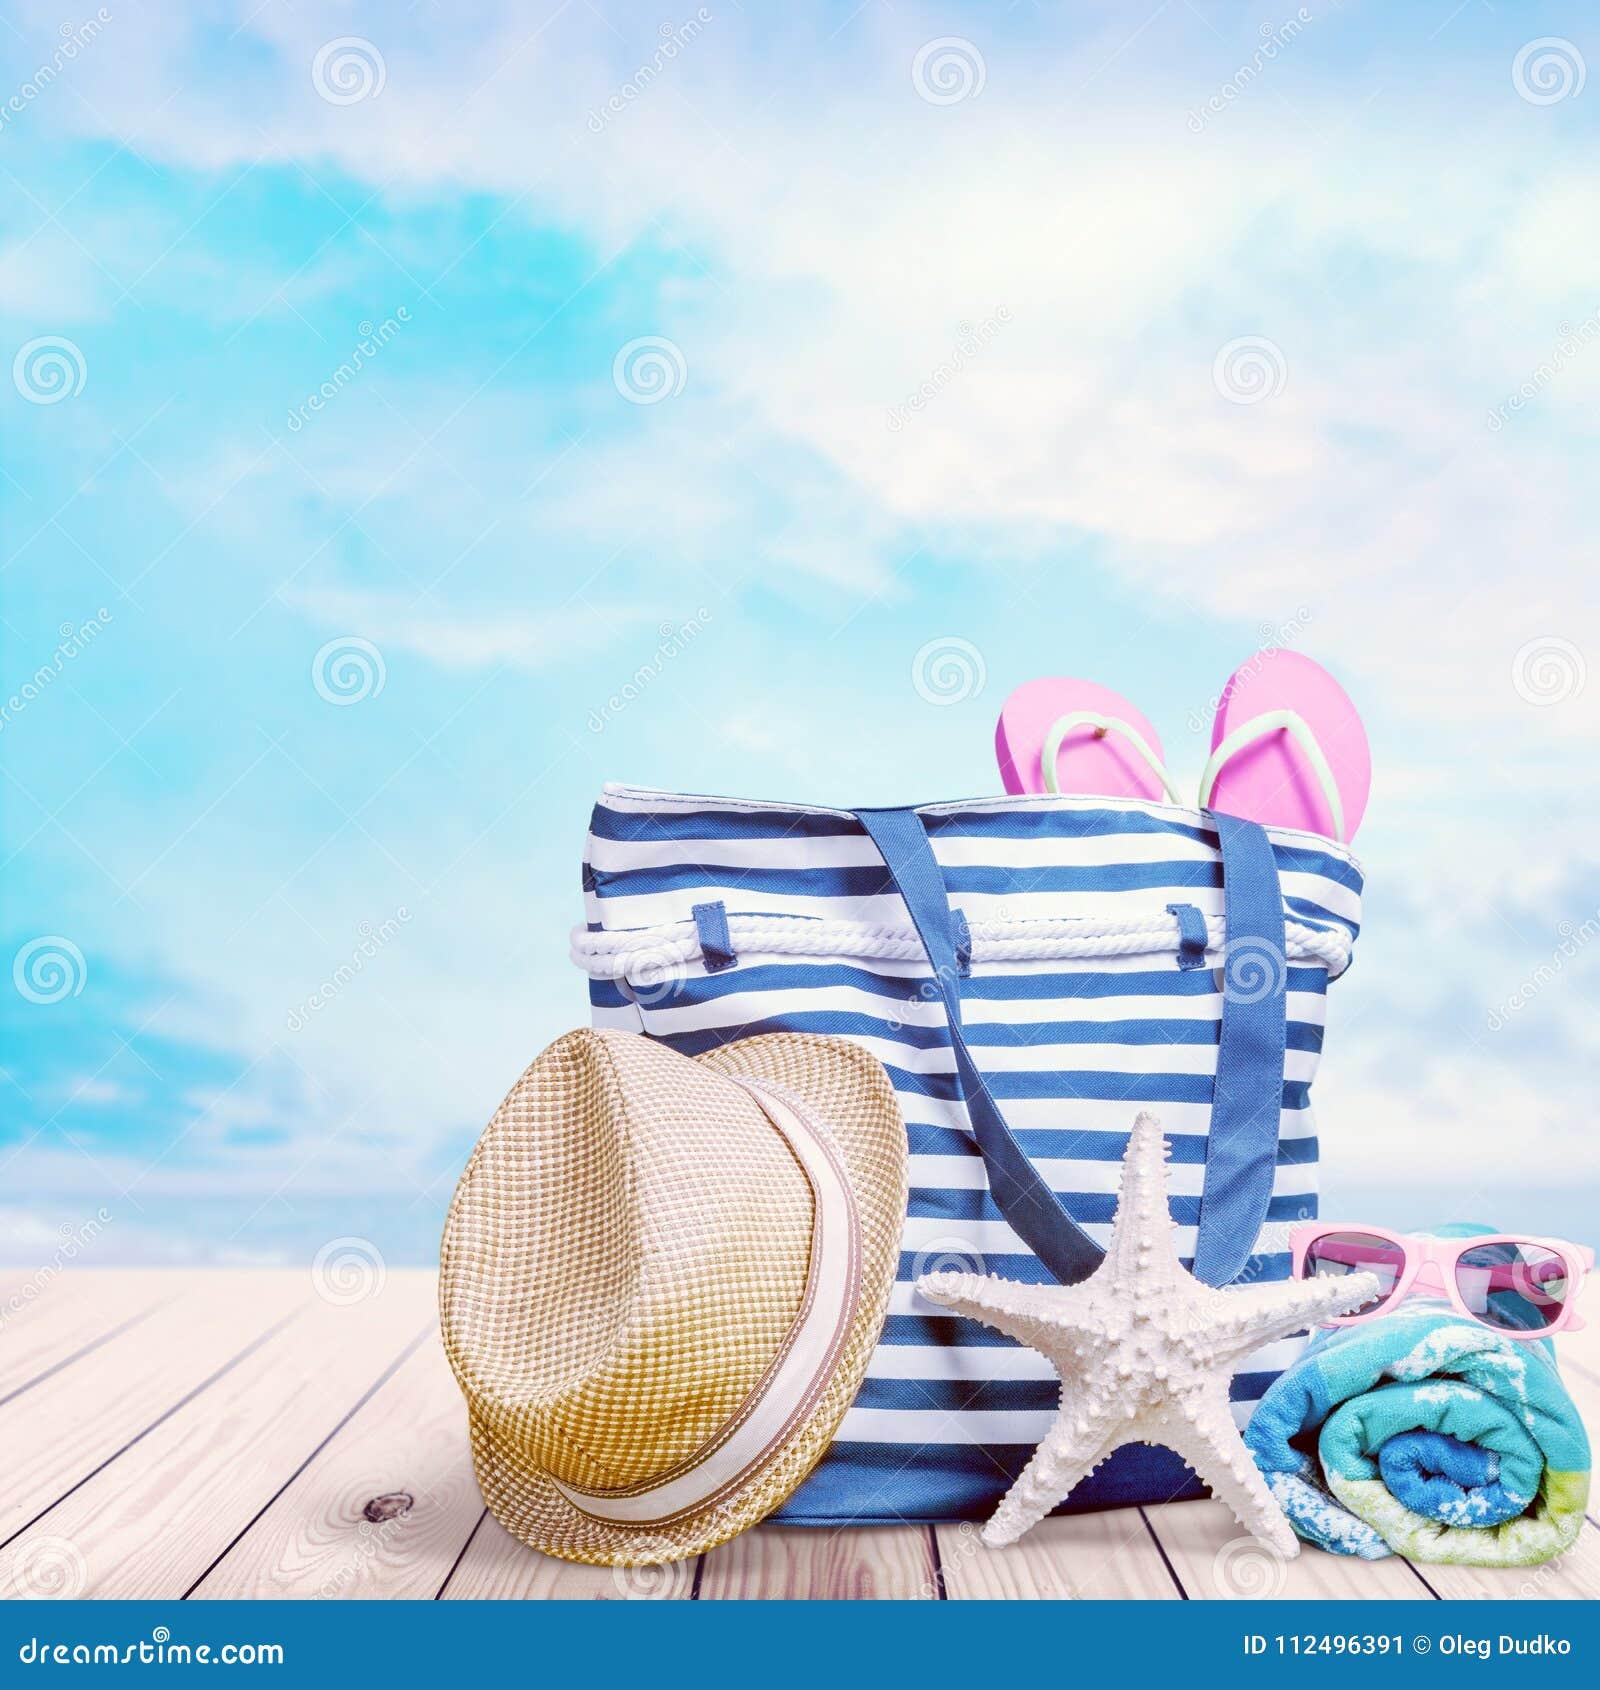 bdcf9a20c Beach Bag On Sand Of Tropical Beach Stock Image - Image of coastal ...